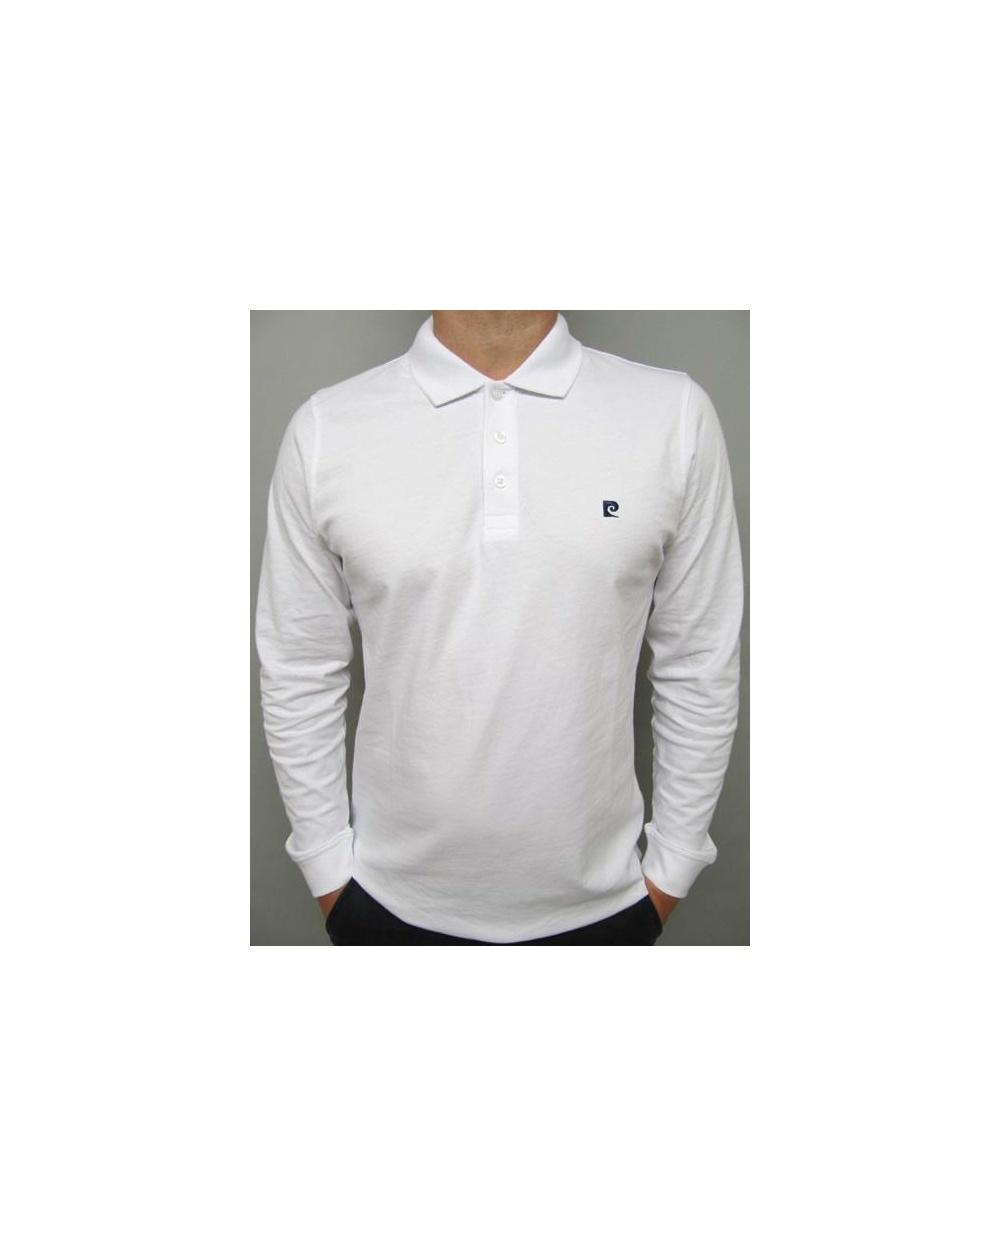 39c22536e Pierre Cardin Heritage L s Polo Shirt White - smart long sleeve polo